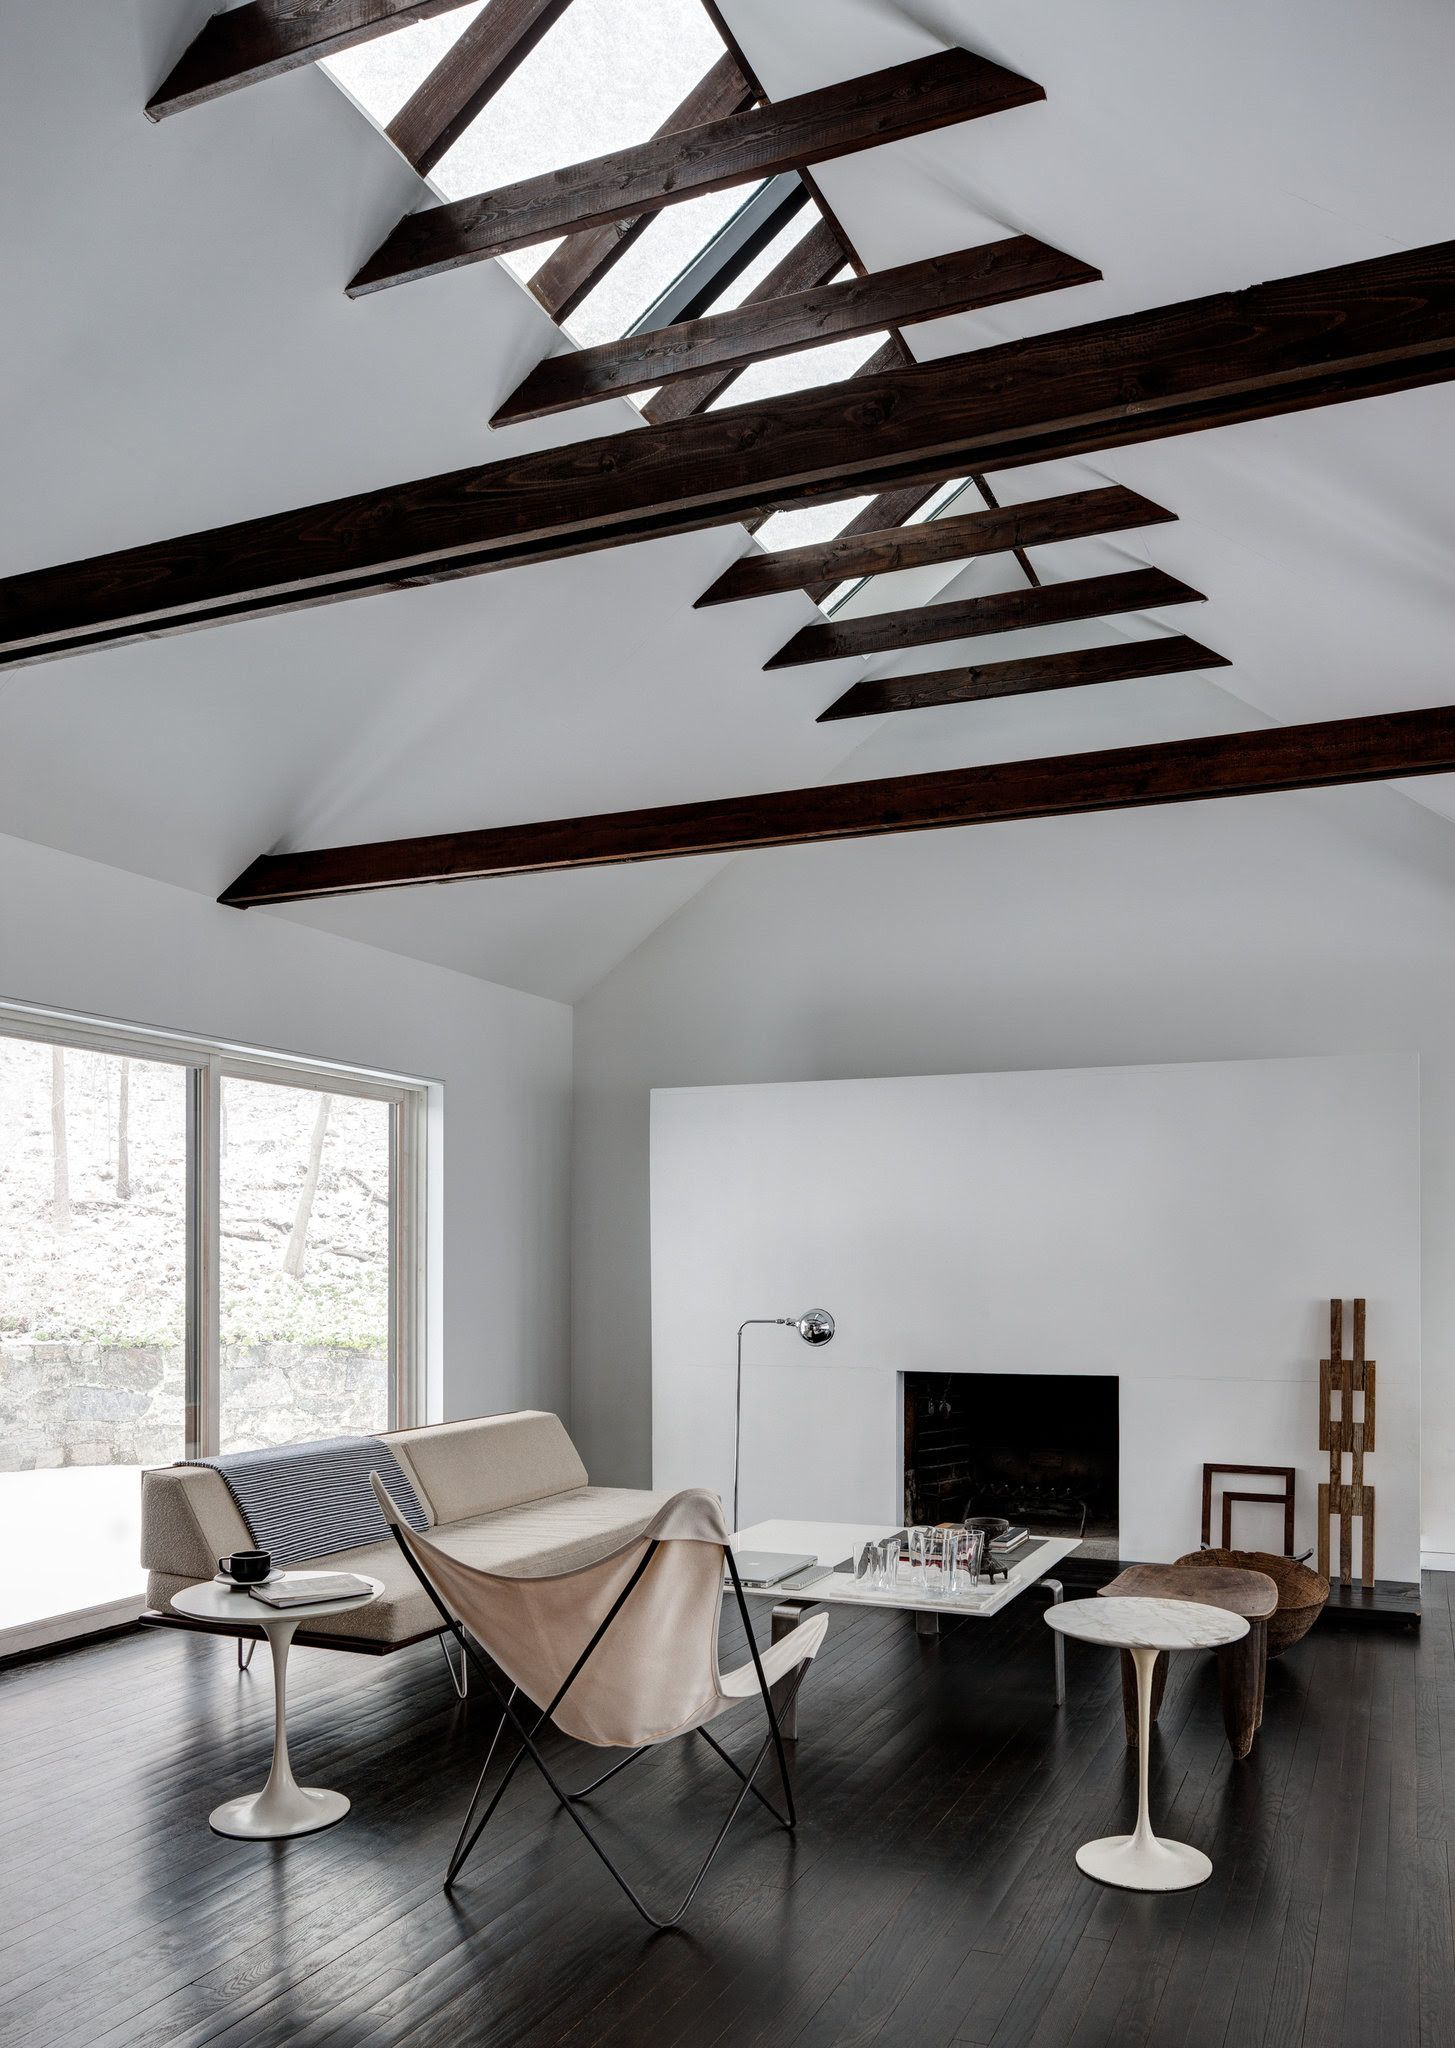 Minimal family home in New York - via Coco Lapine Design